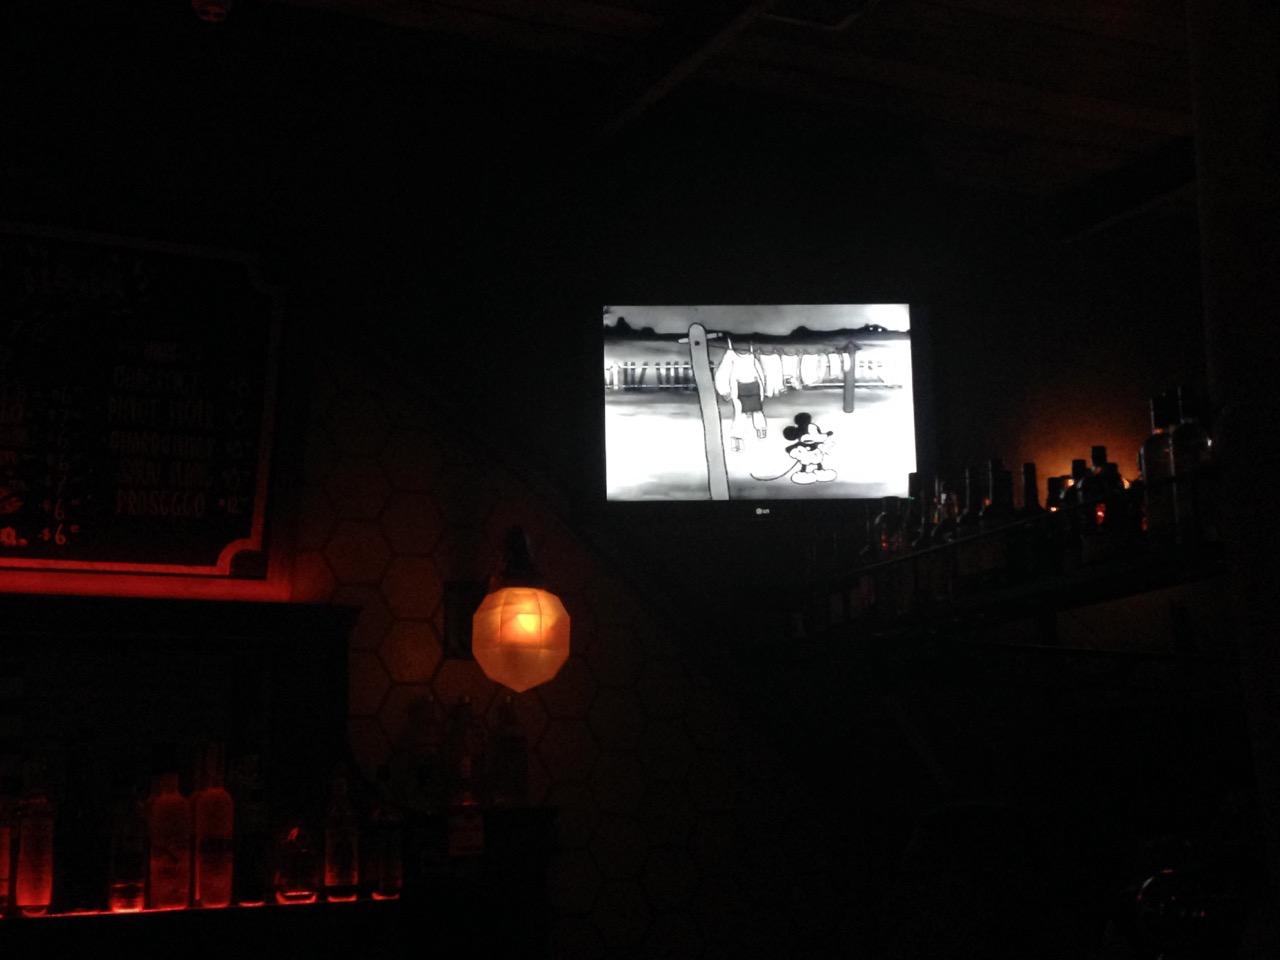 3 Days in L.A. - PowerHouse Legendary Bar (3)